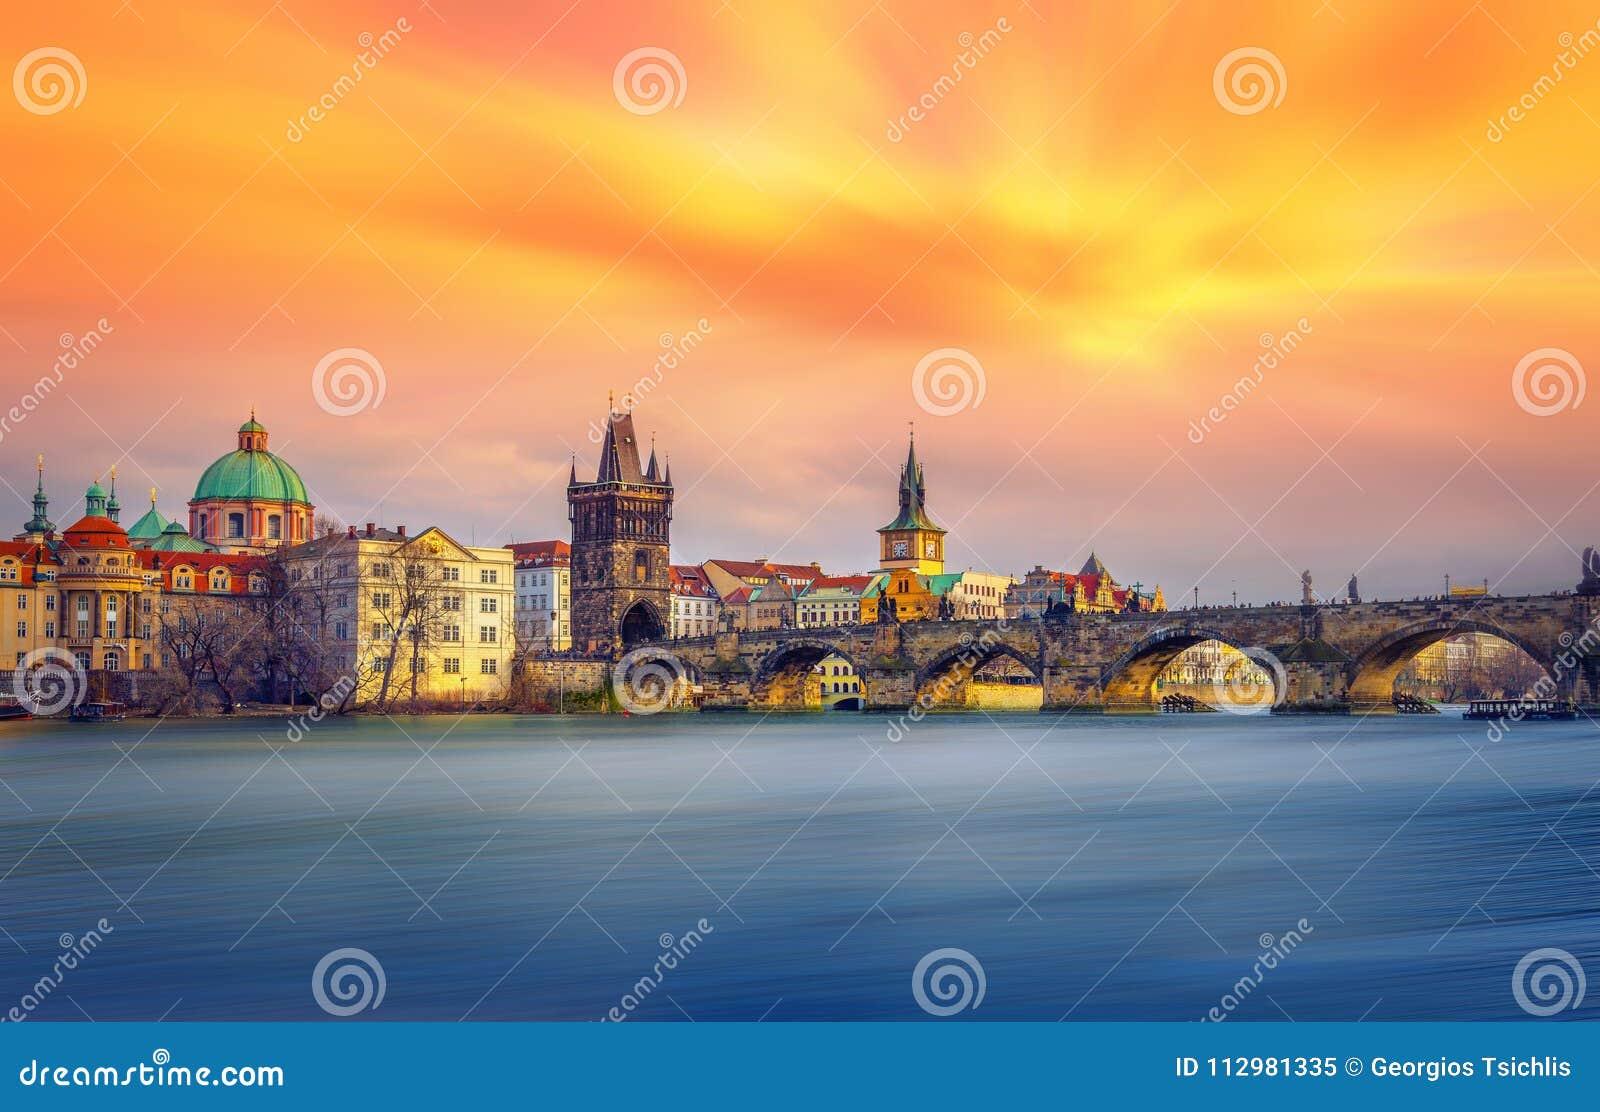 Famous Charles Bridge and tower, Prague.